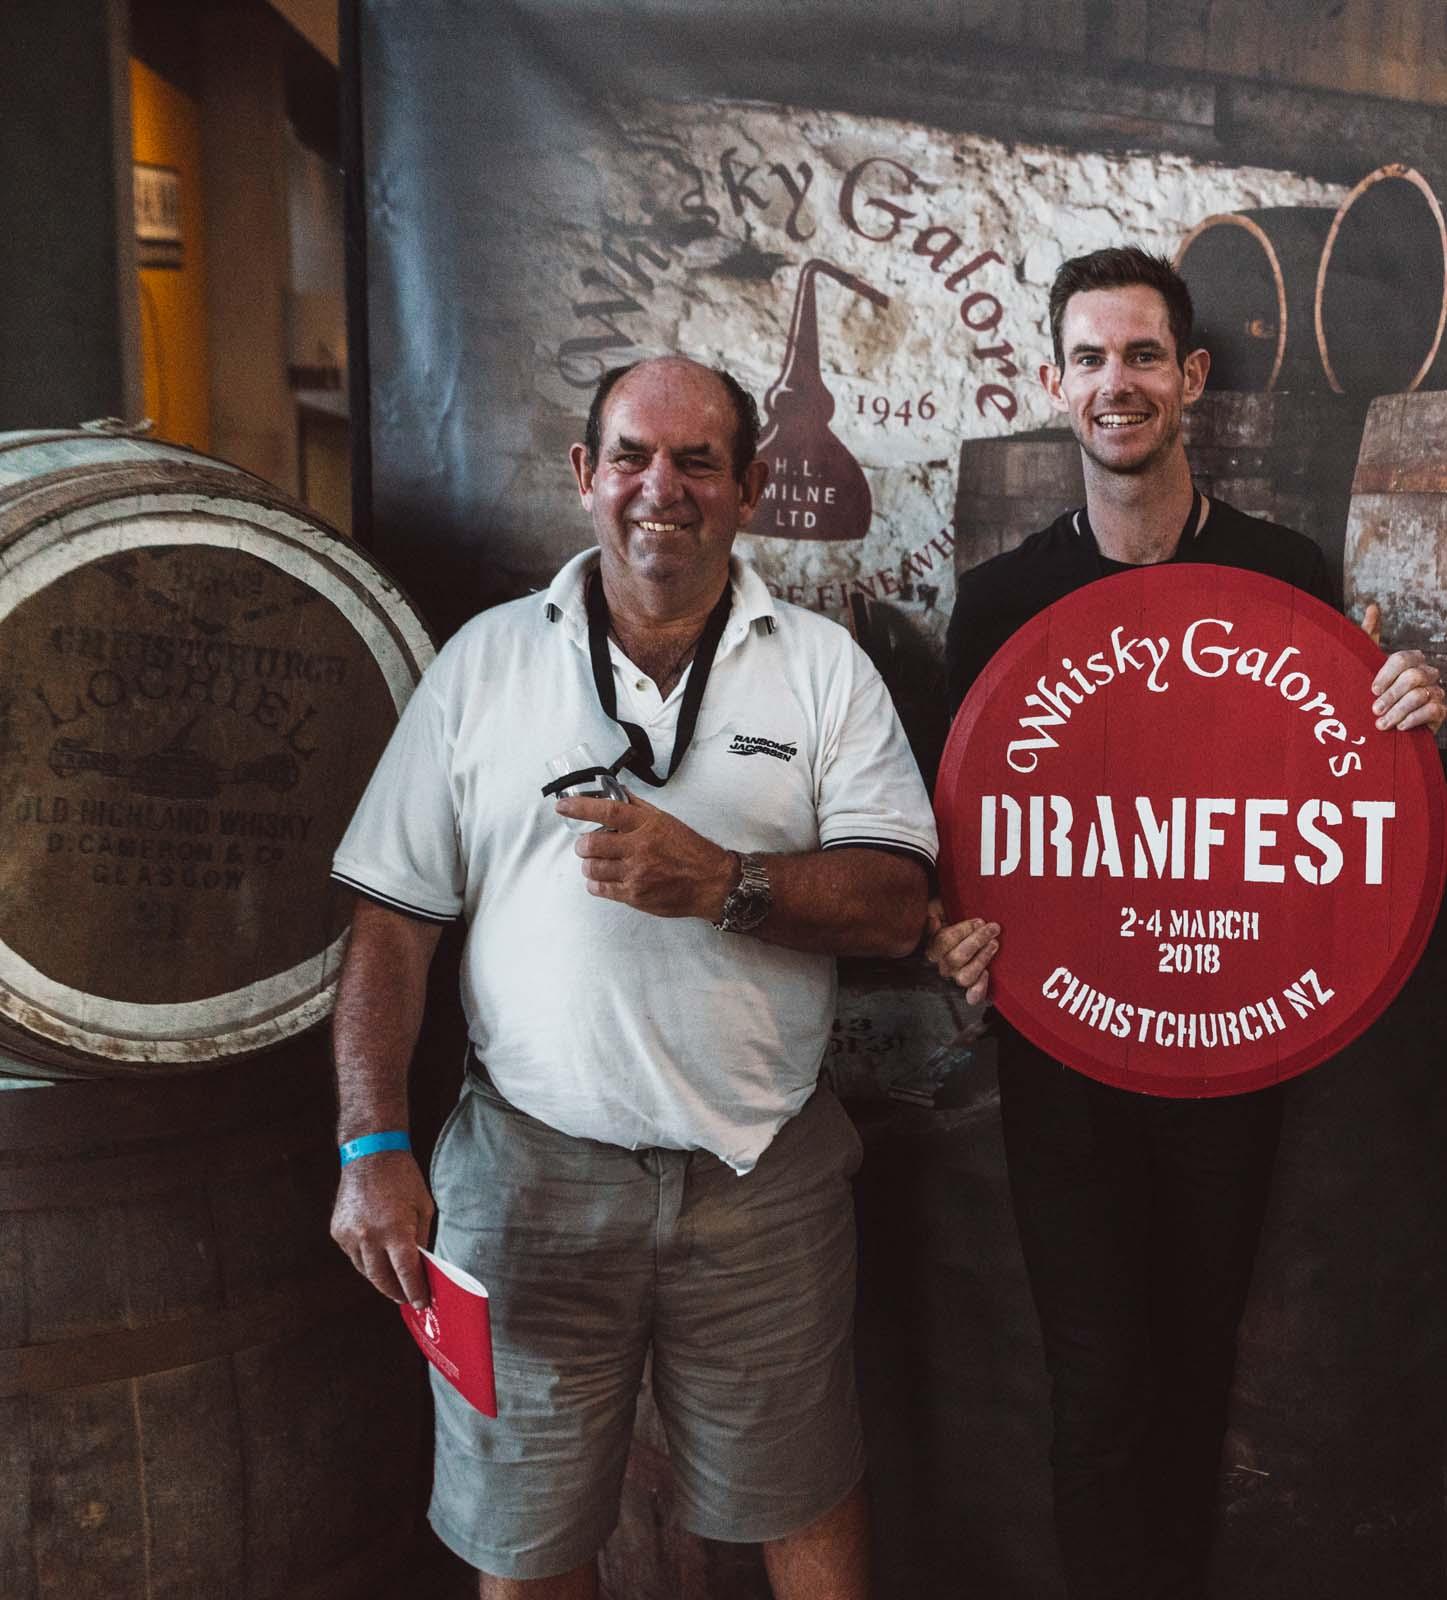 Dramfest 2018 for Whisky Galore-92.jpg